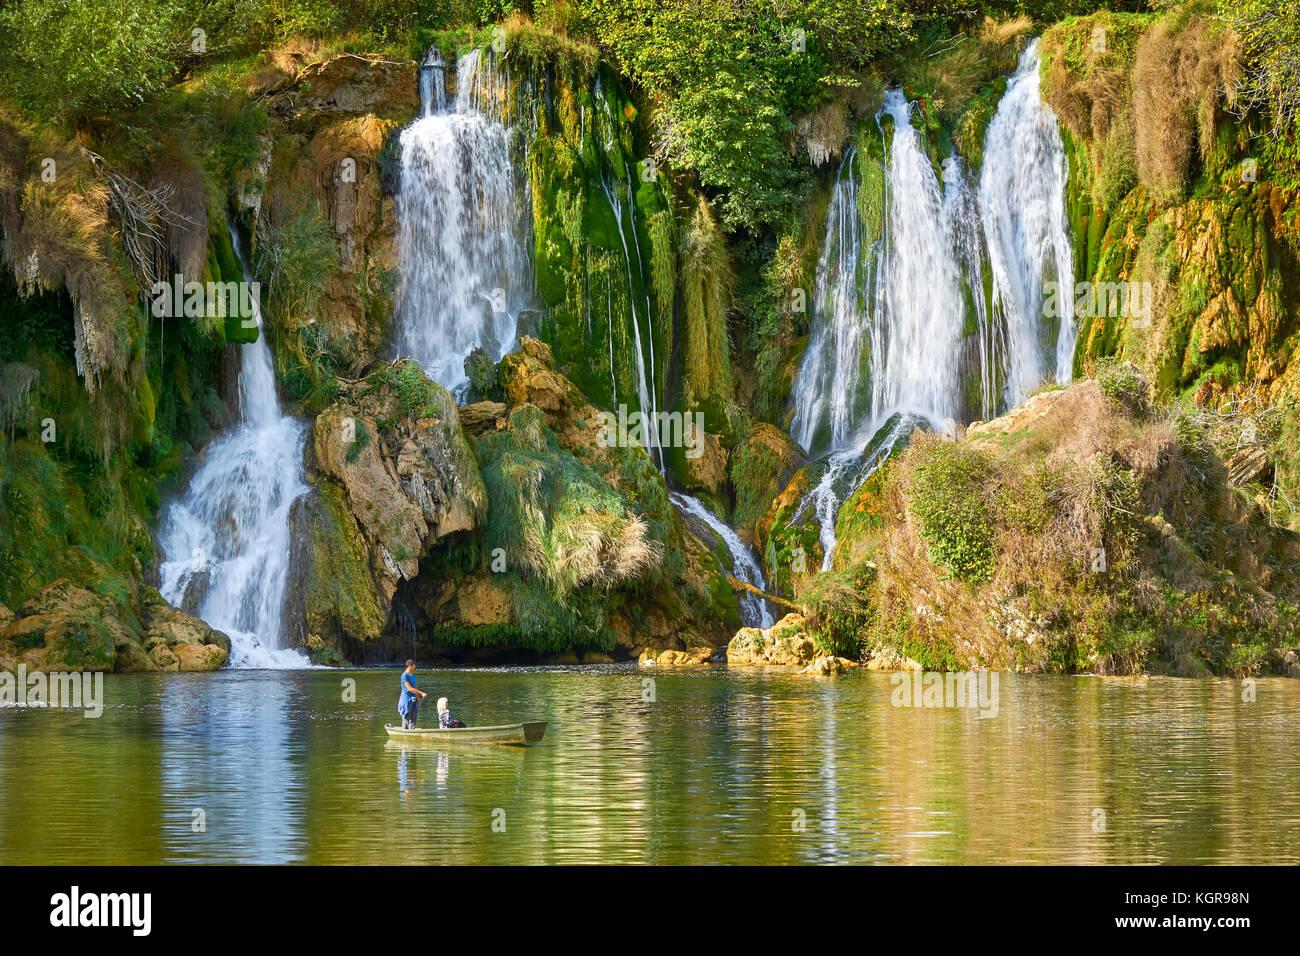 I turisti in barca, Kravica cascate, Bosnia ed Erzegovina Immagini Stock